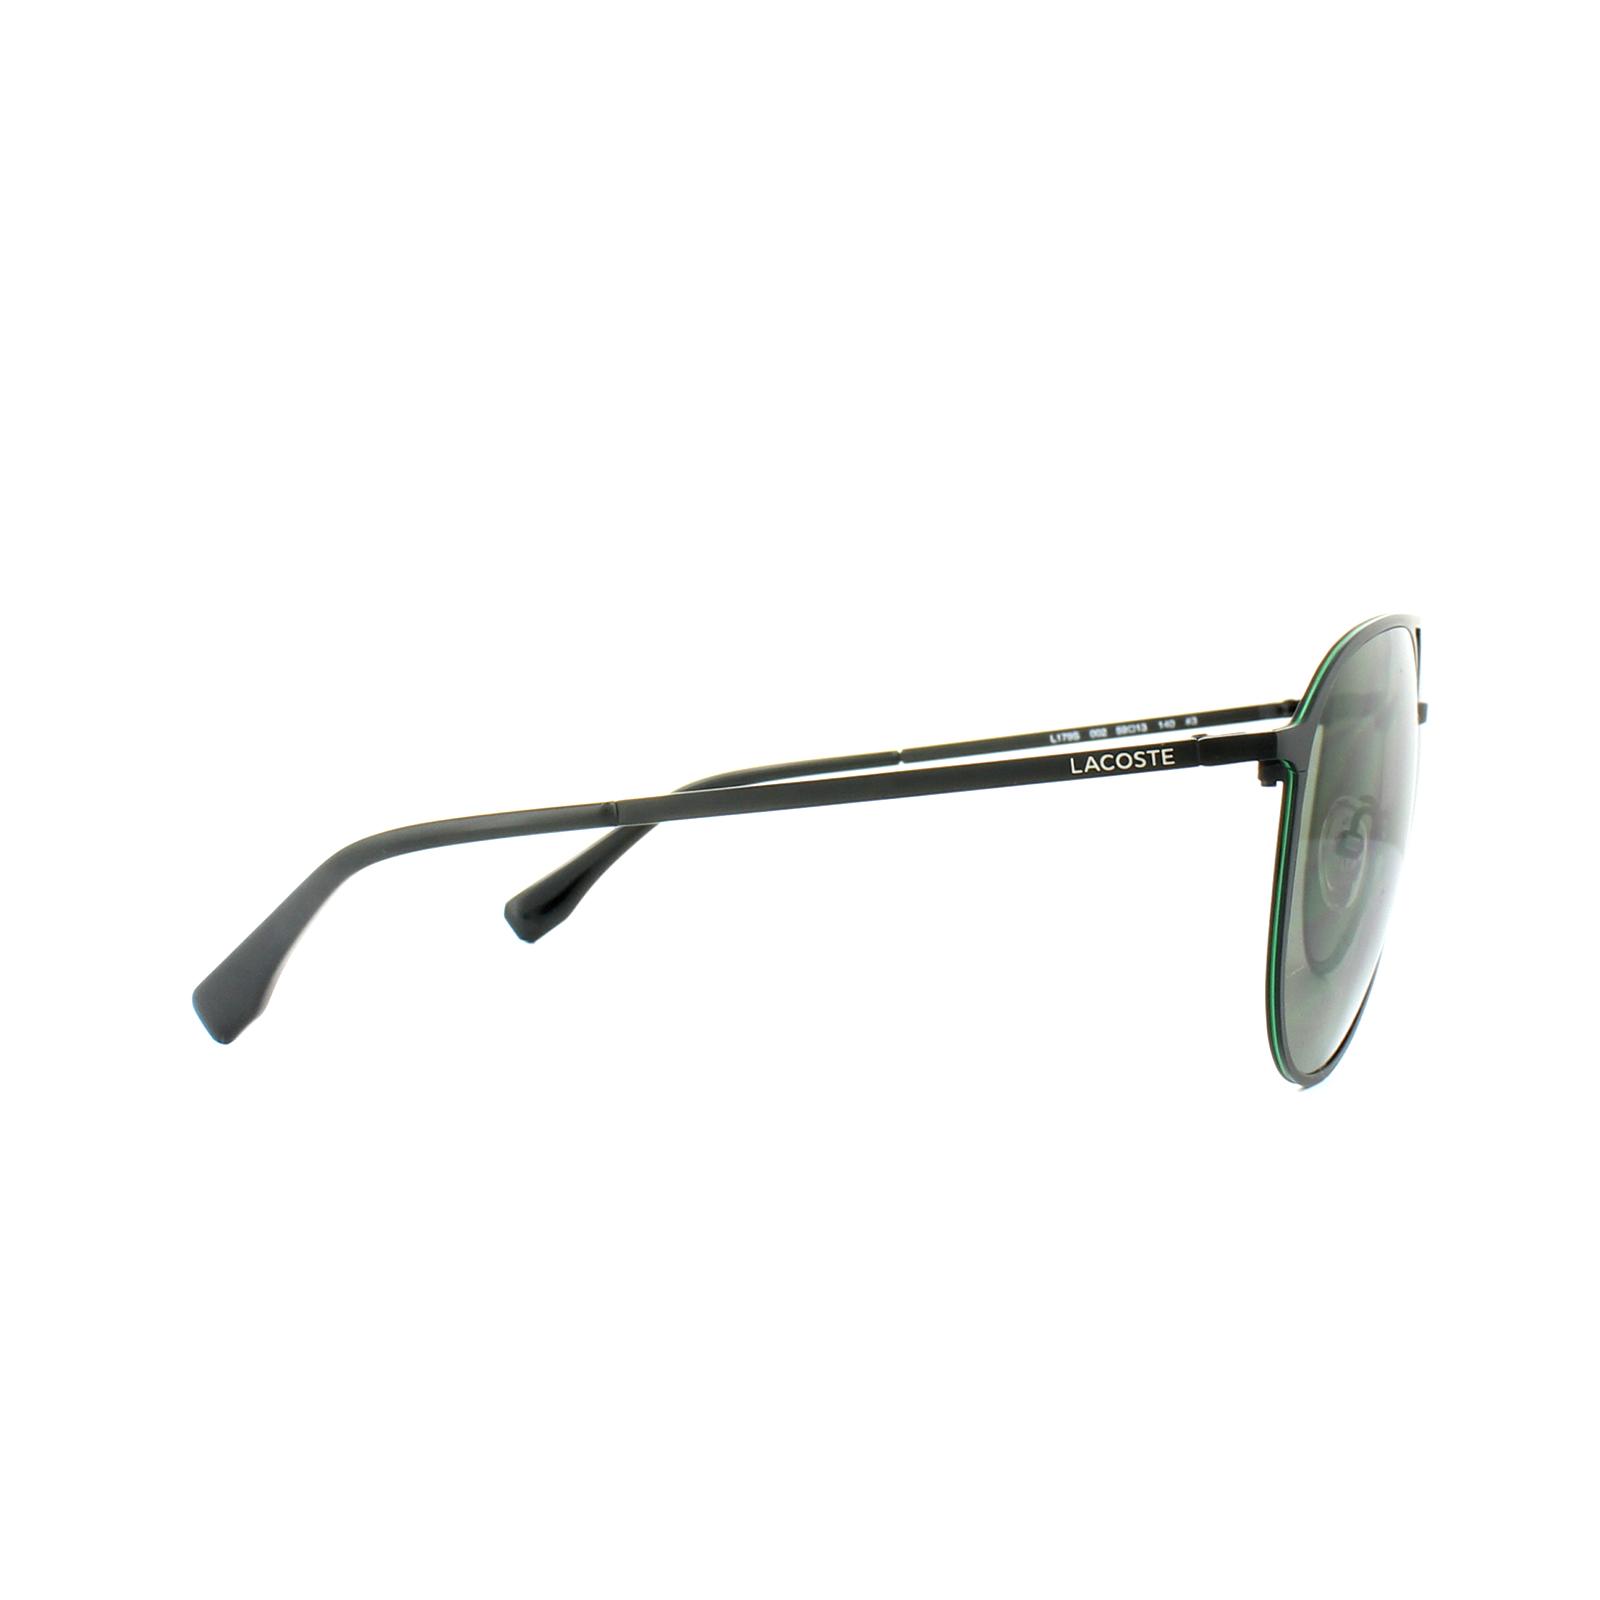 93b13b3b03e6 Lacoste Sunglasses L179S 002 Matt Black Green 886895278300